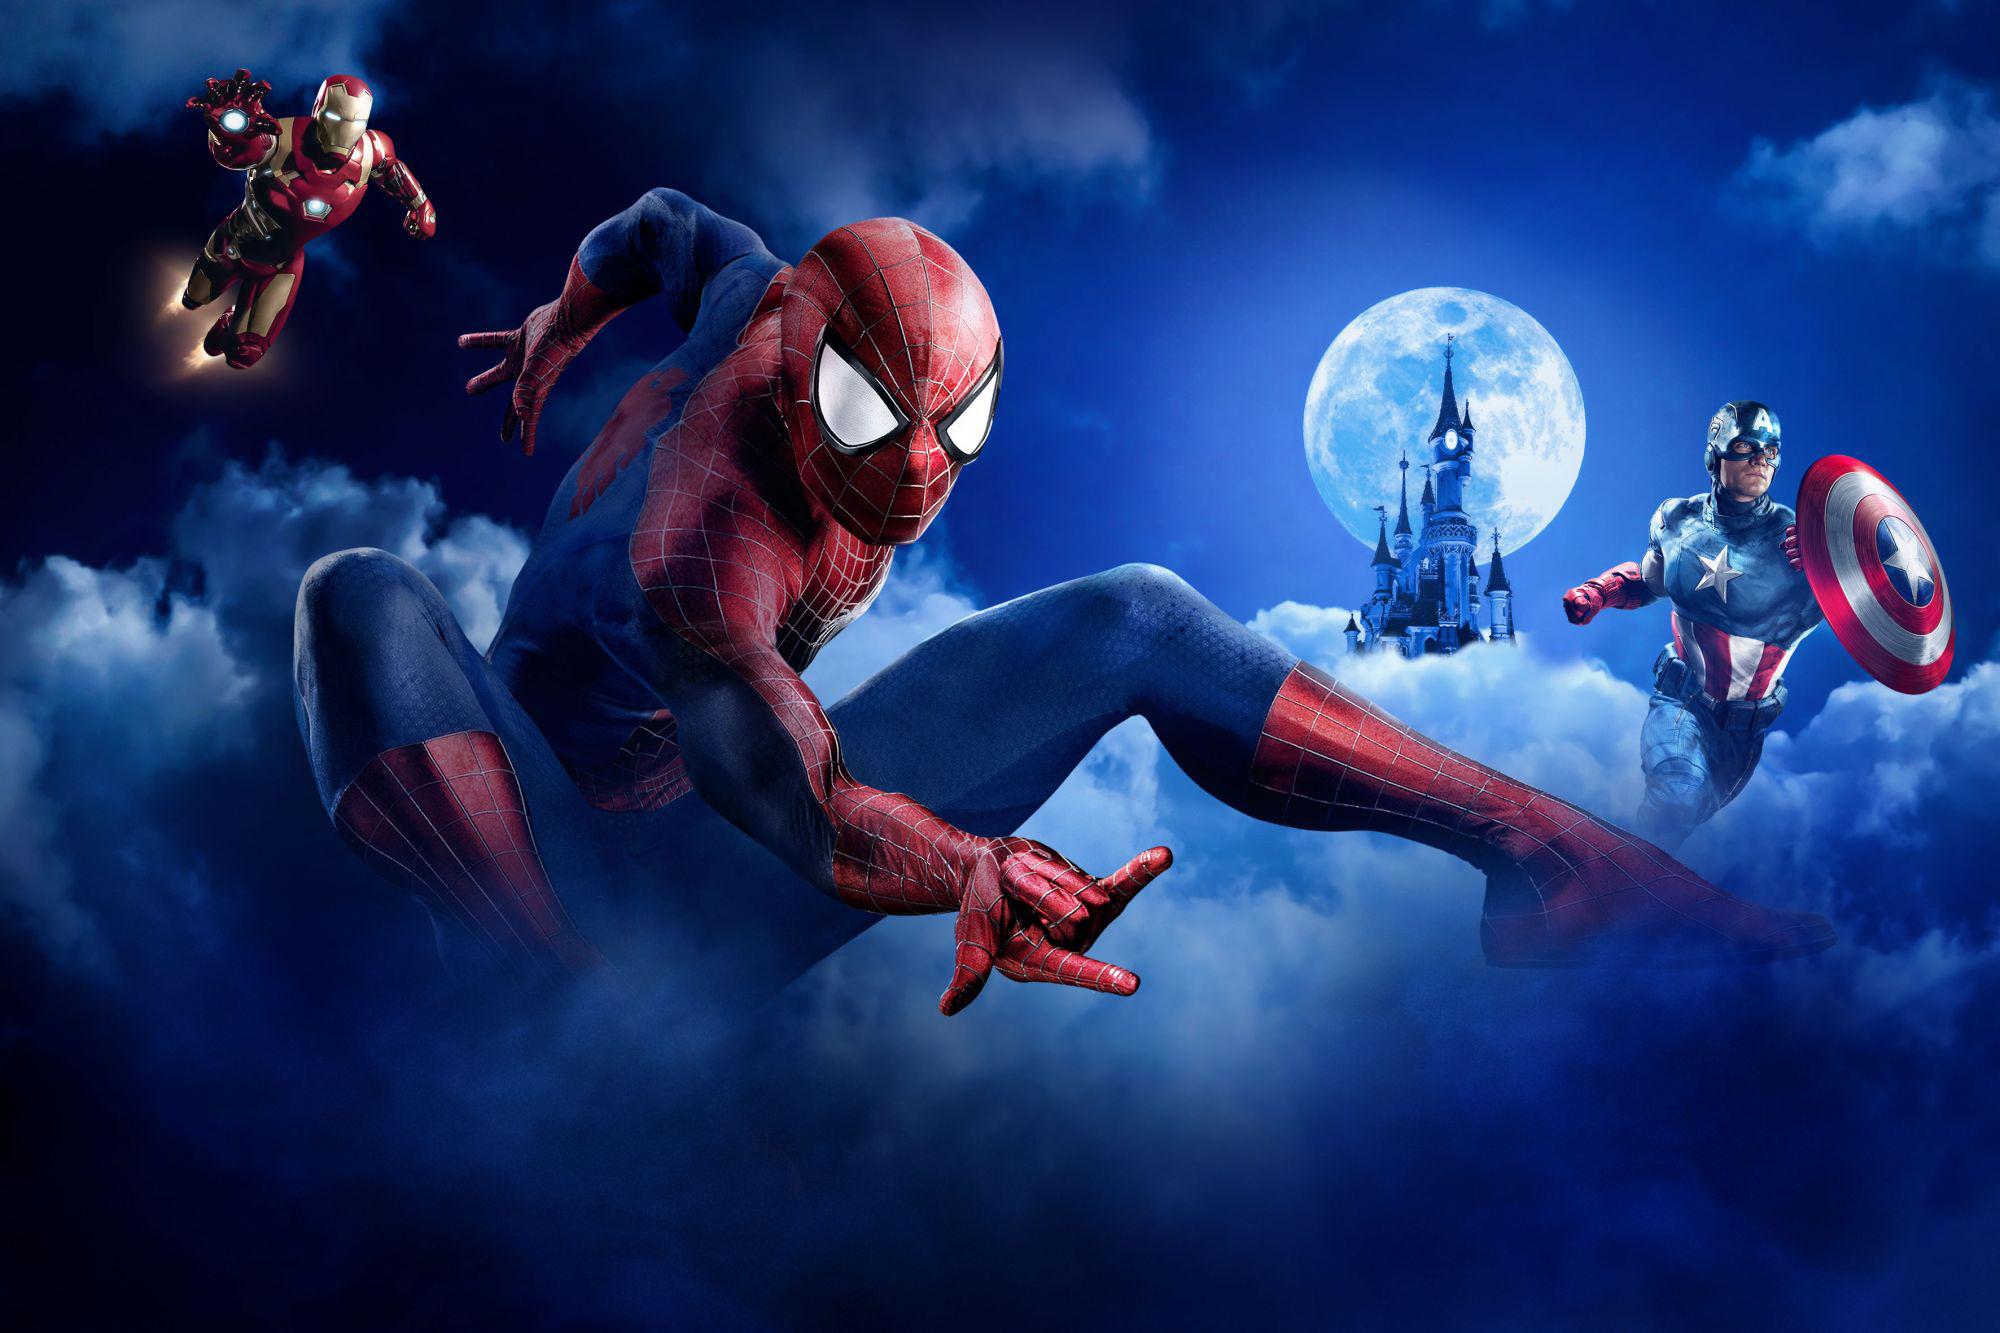 Spiderman Iron Man Captain America